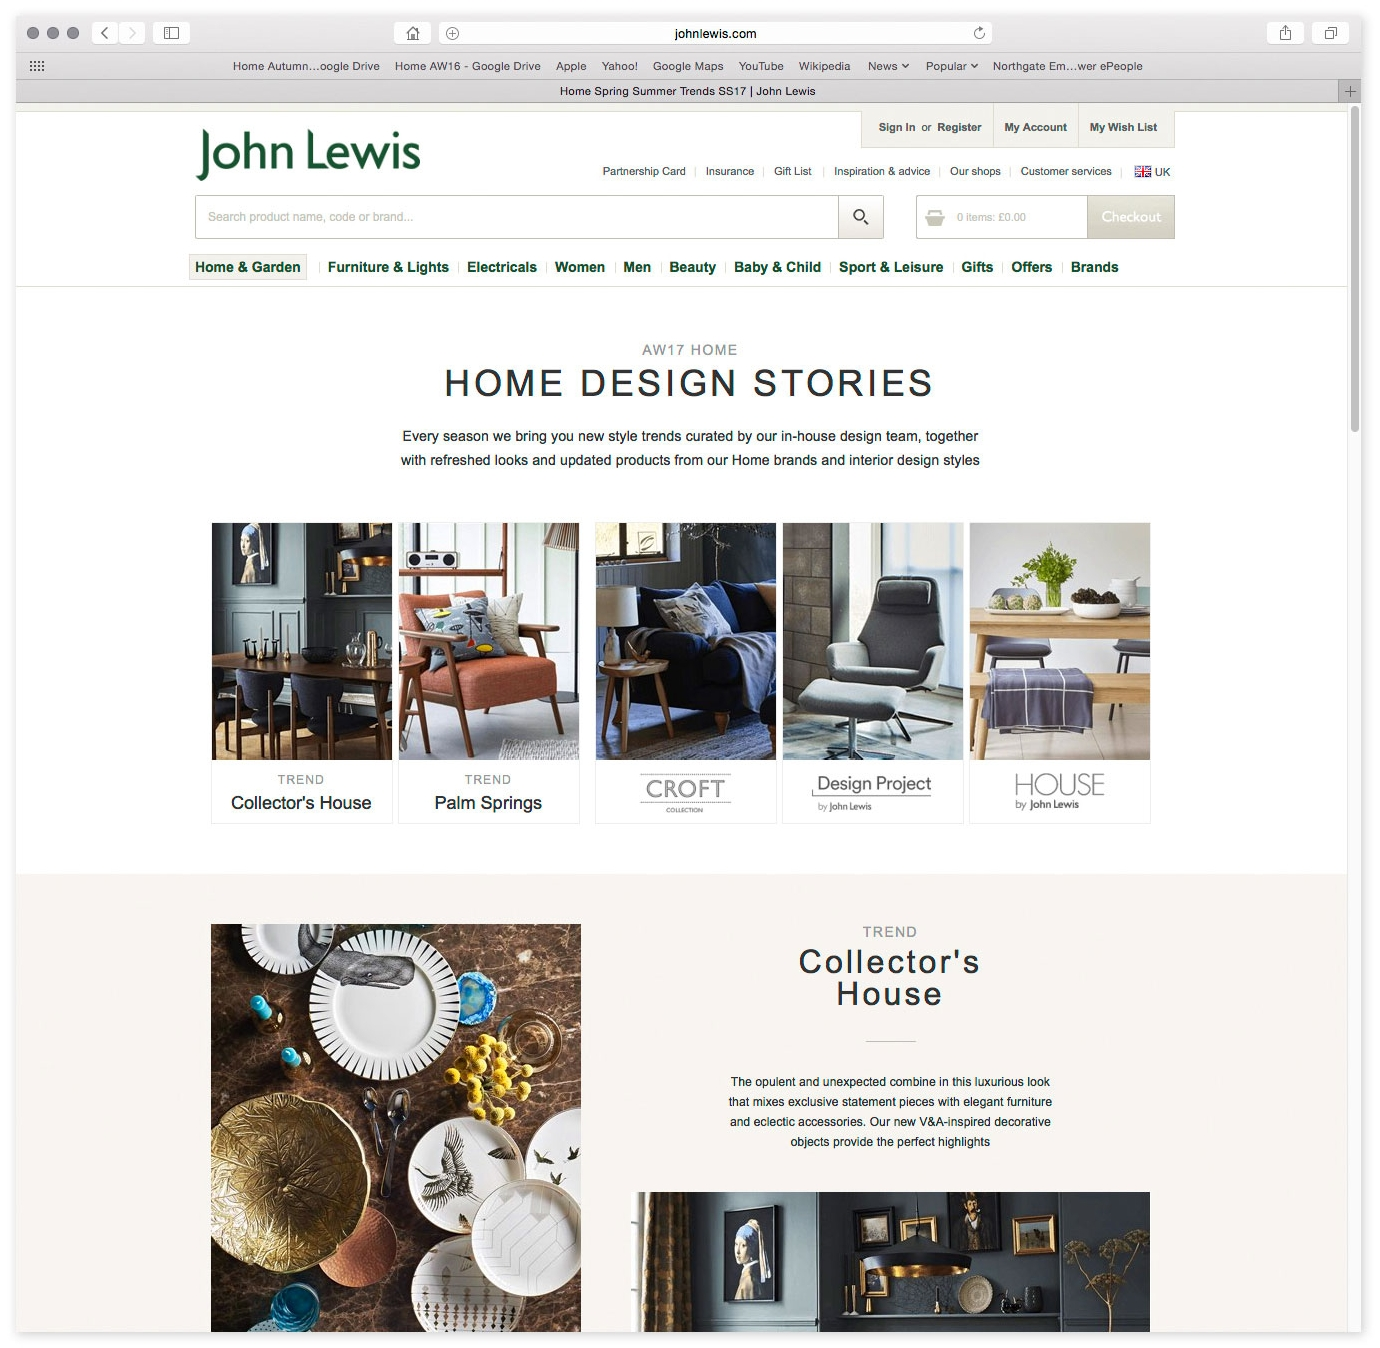 Home-design-stories.jpg